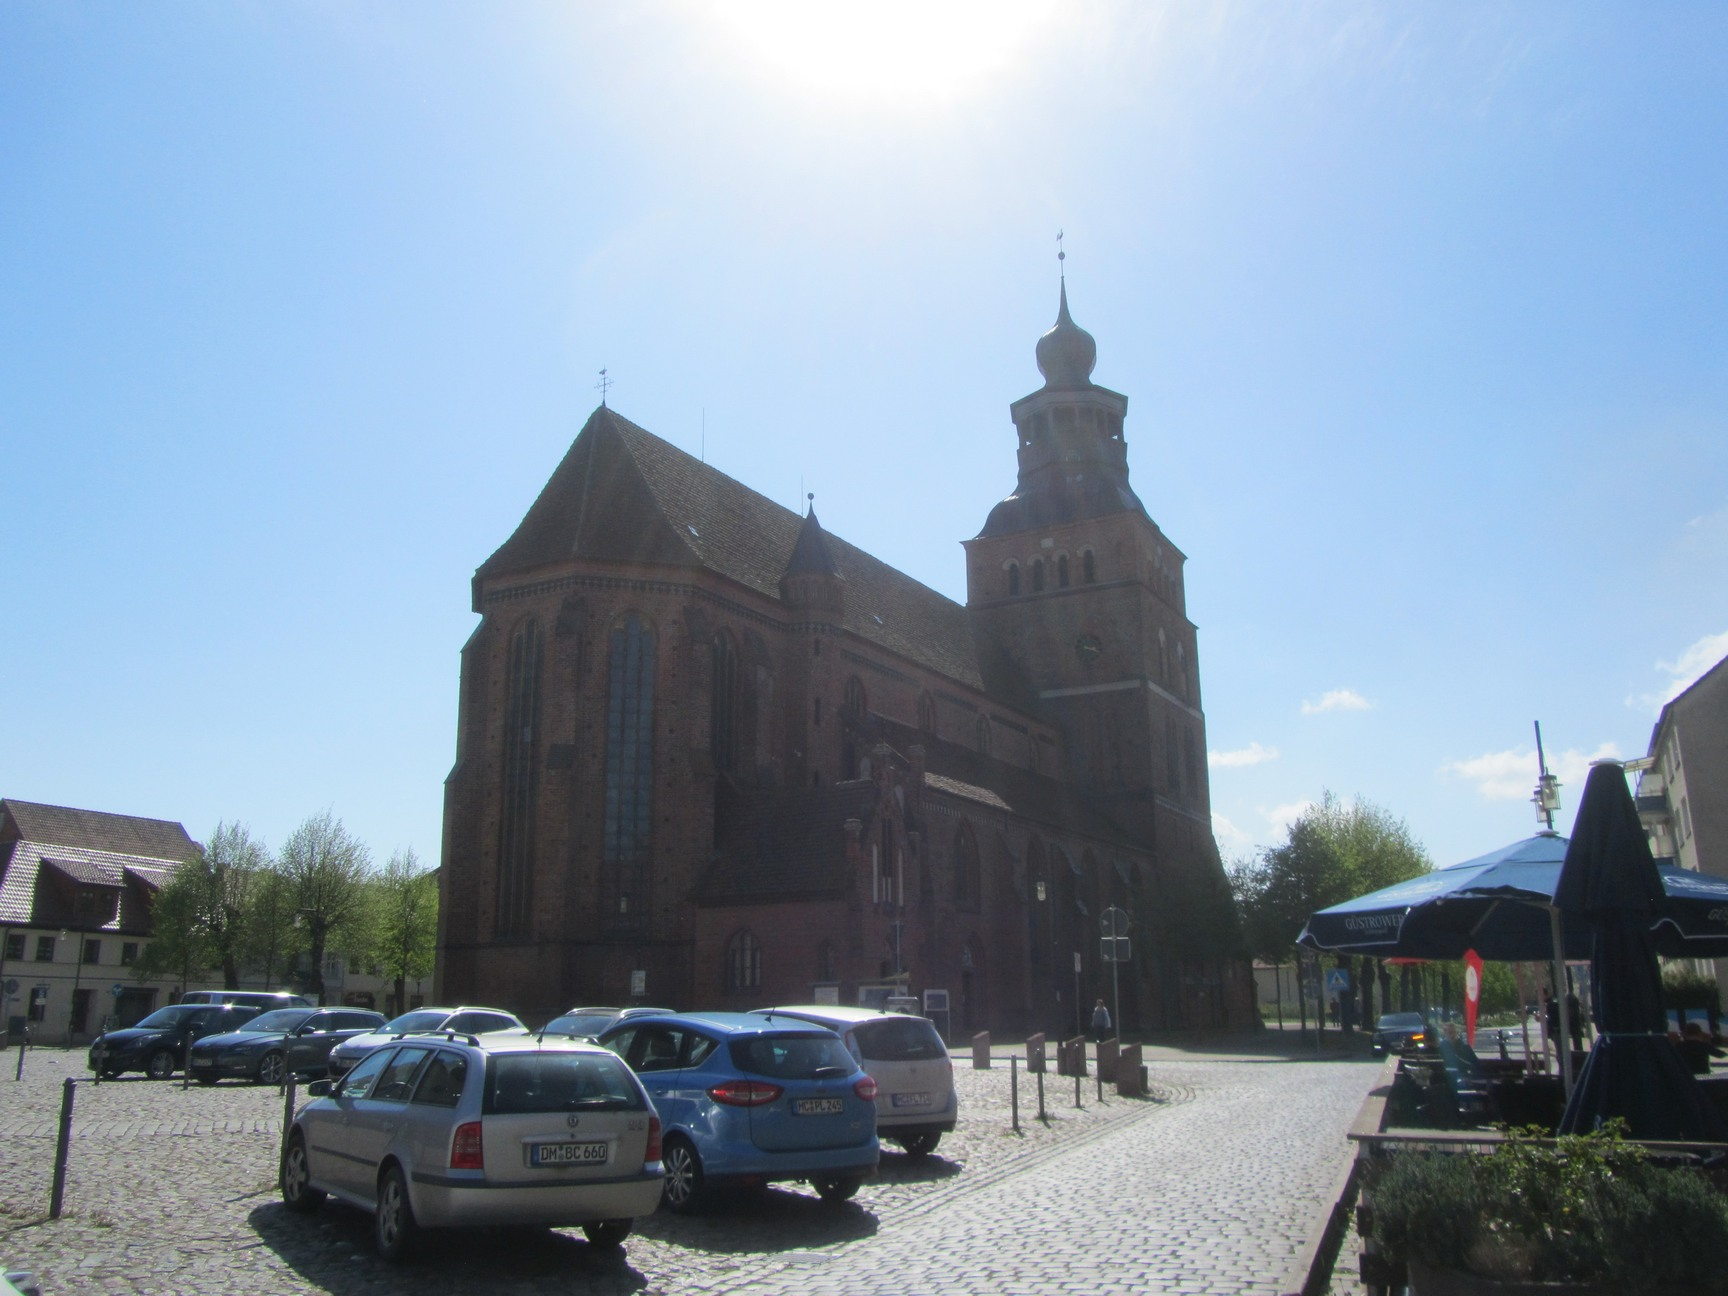 St. Johannis Malchin